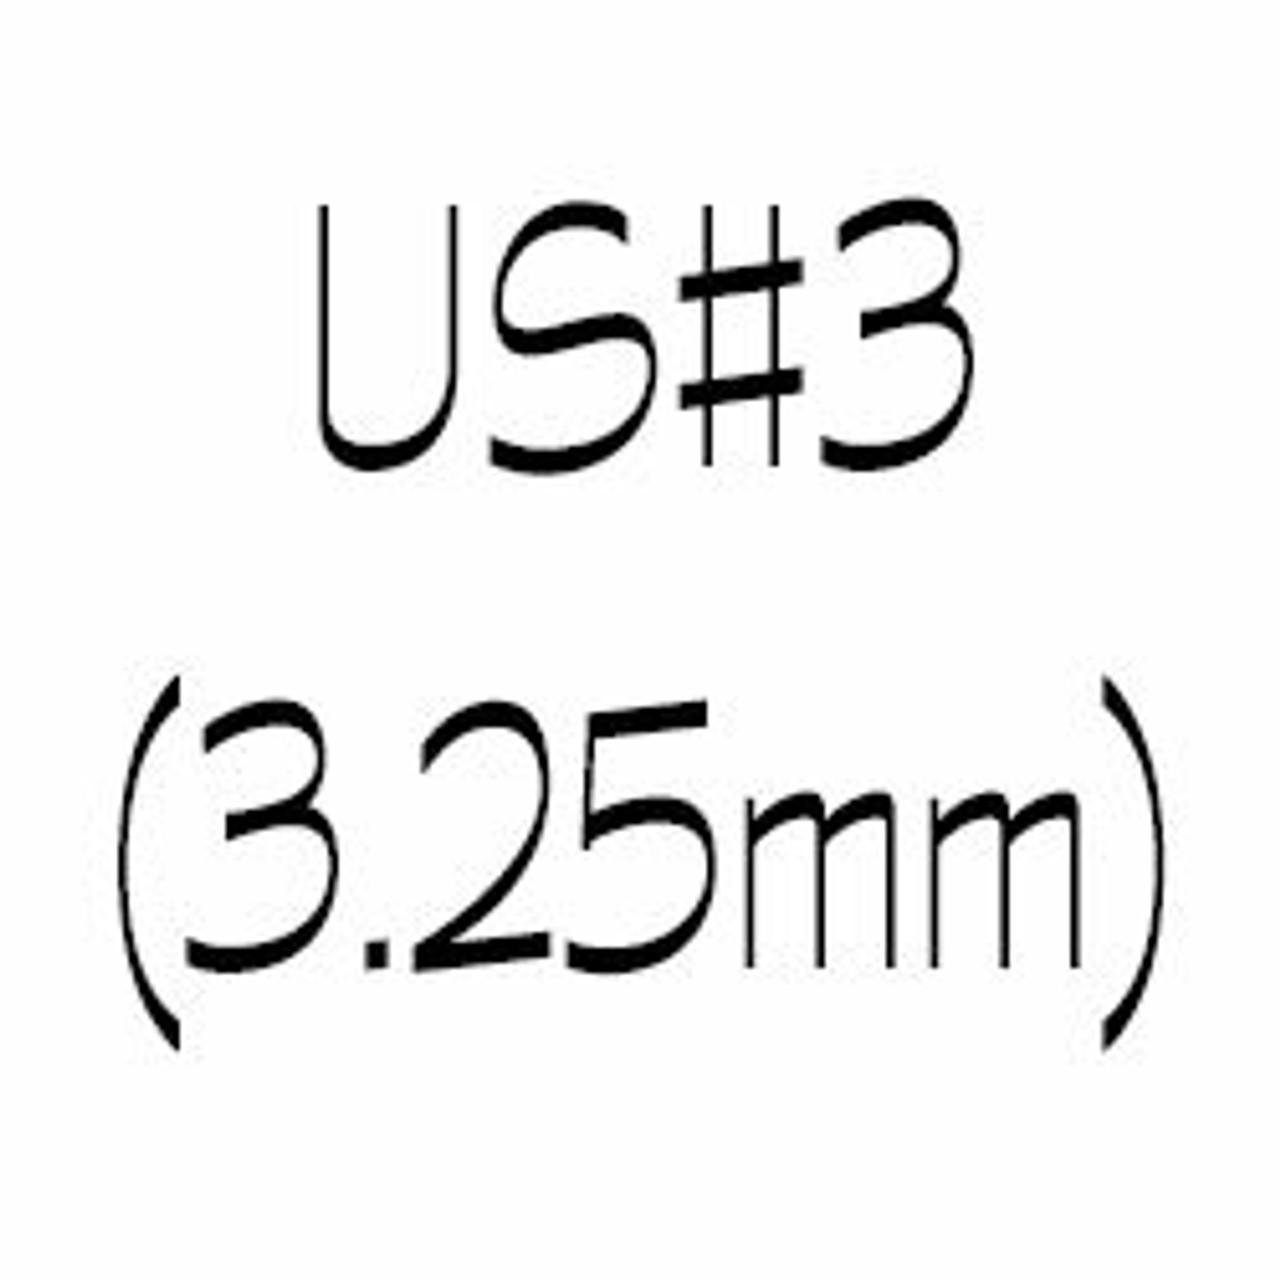 US#3 (3.25mm) circular knitting needles